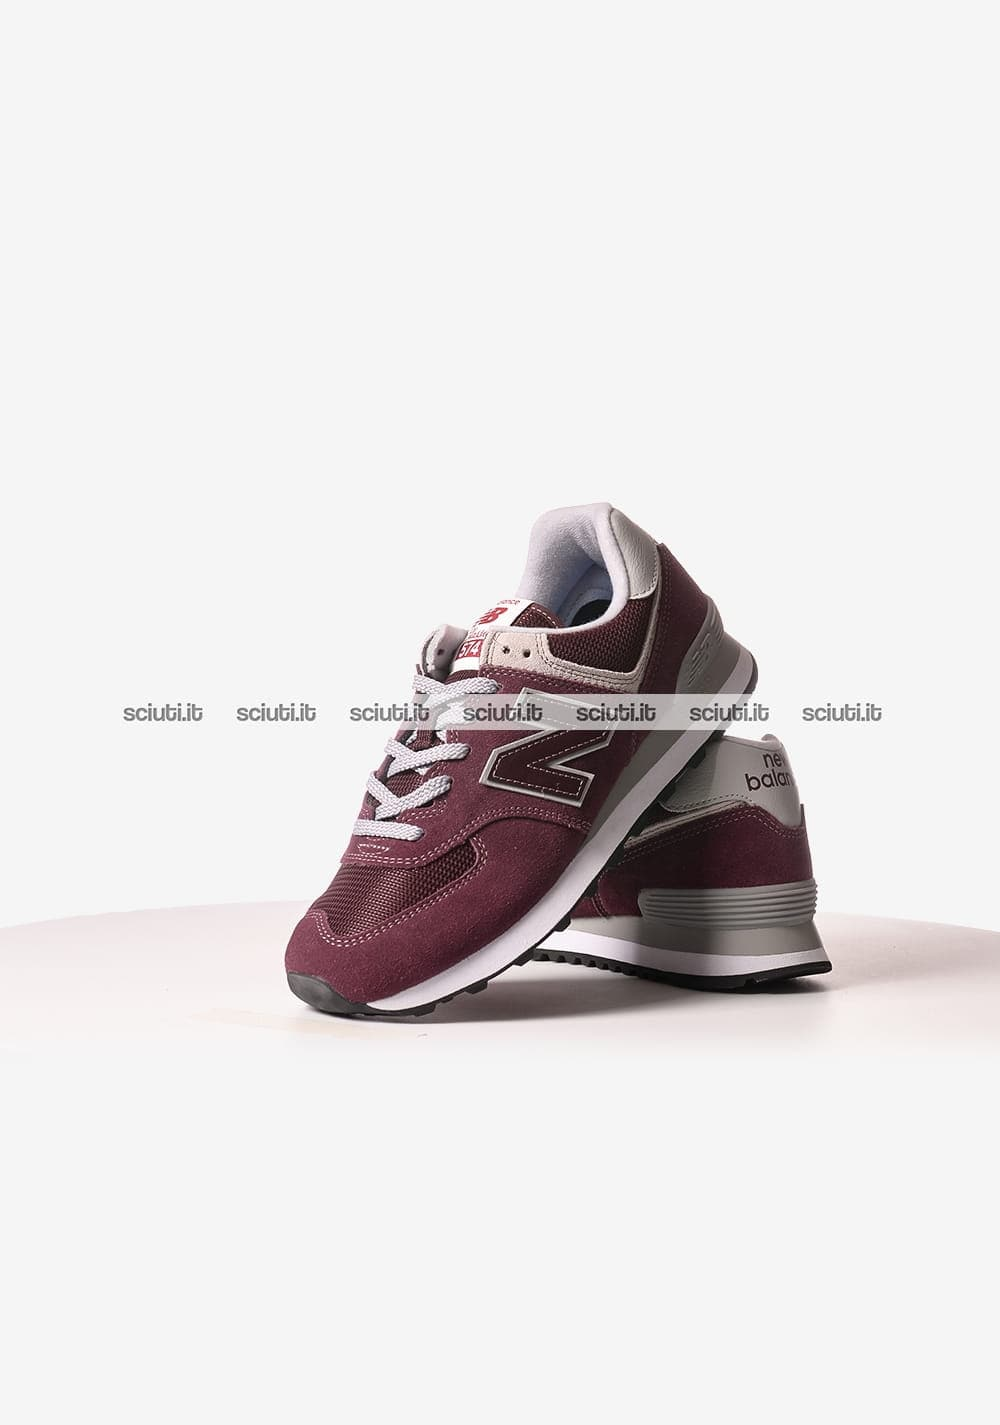 scarpe new balance uomo 574 bordeaux